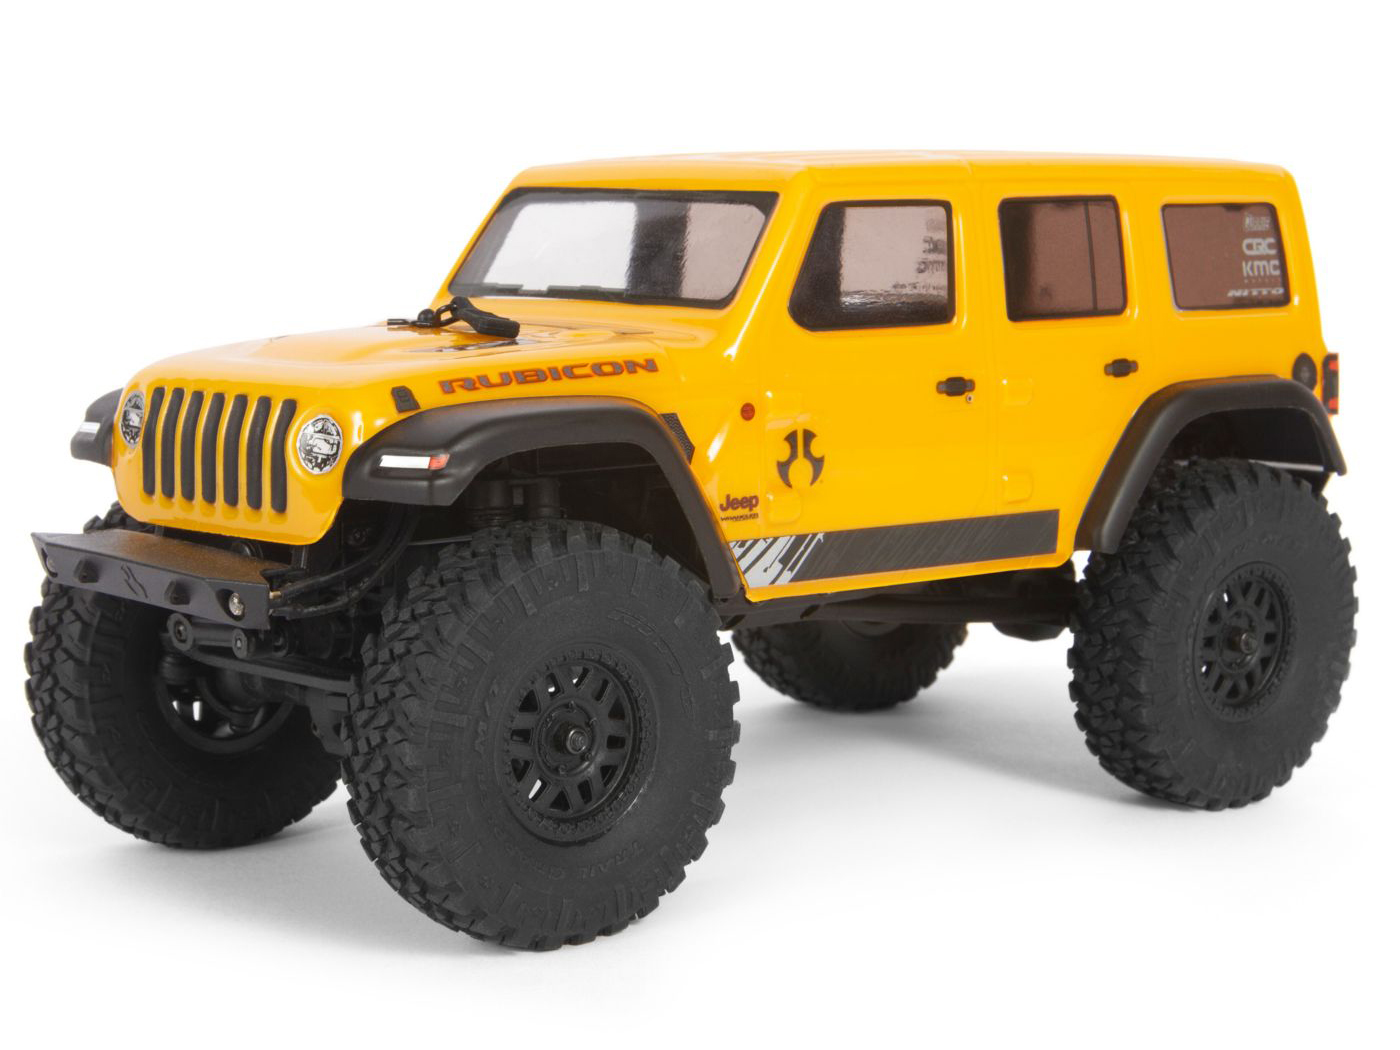 Axial SCX24 1/24 Jeep Wrangler JLU CRC RTR Yellow